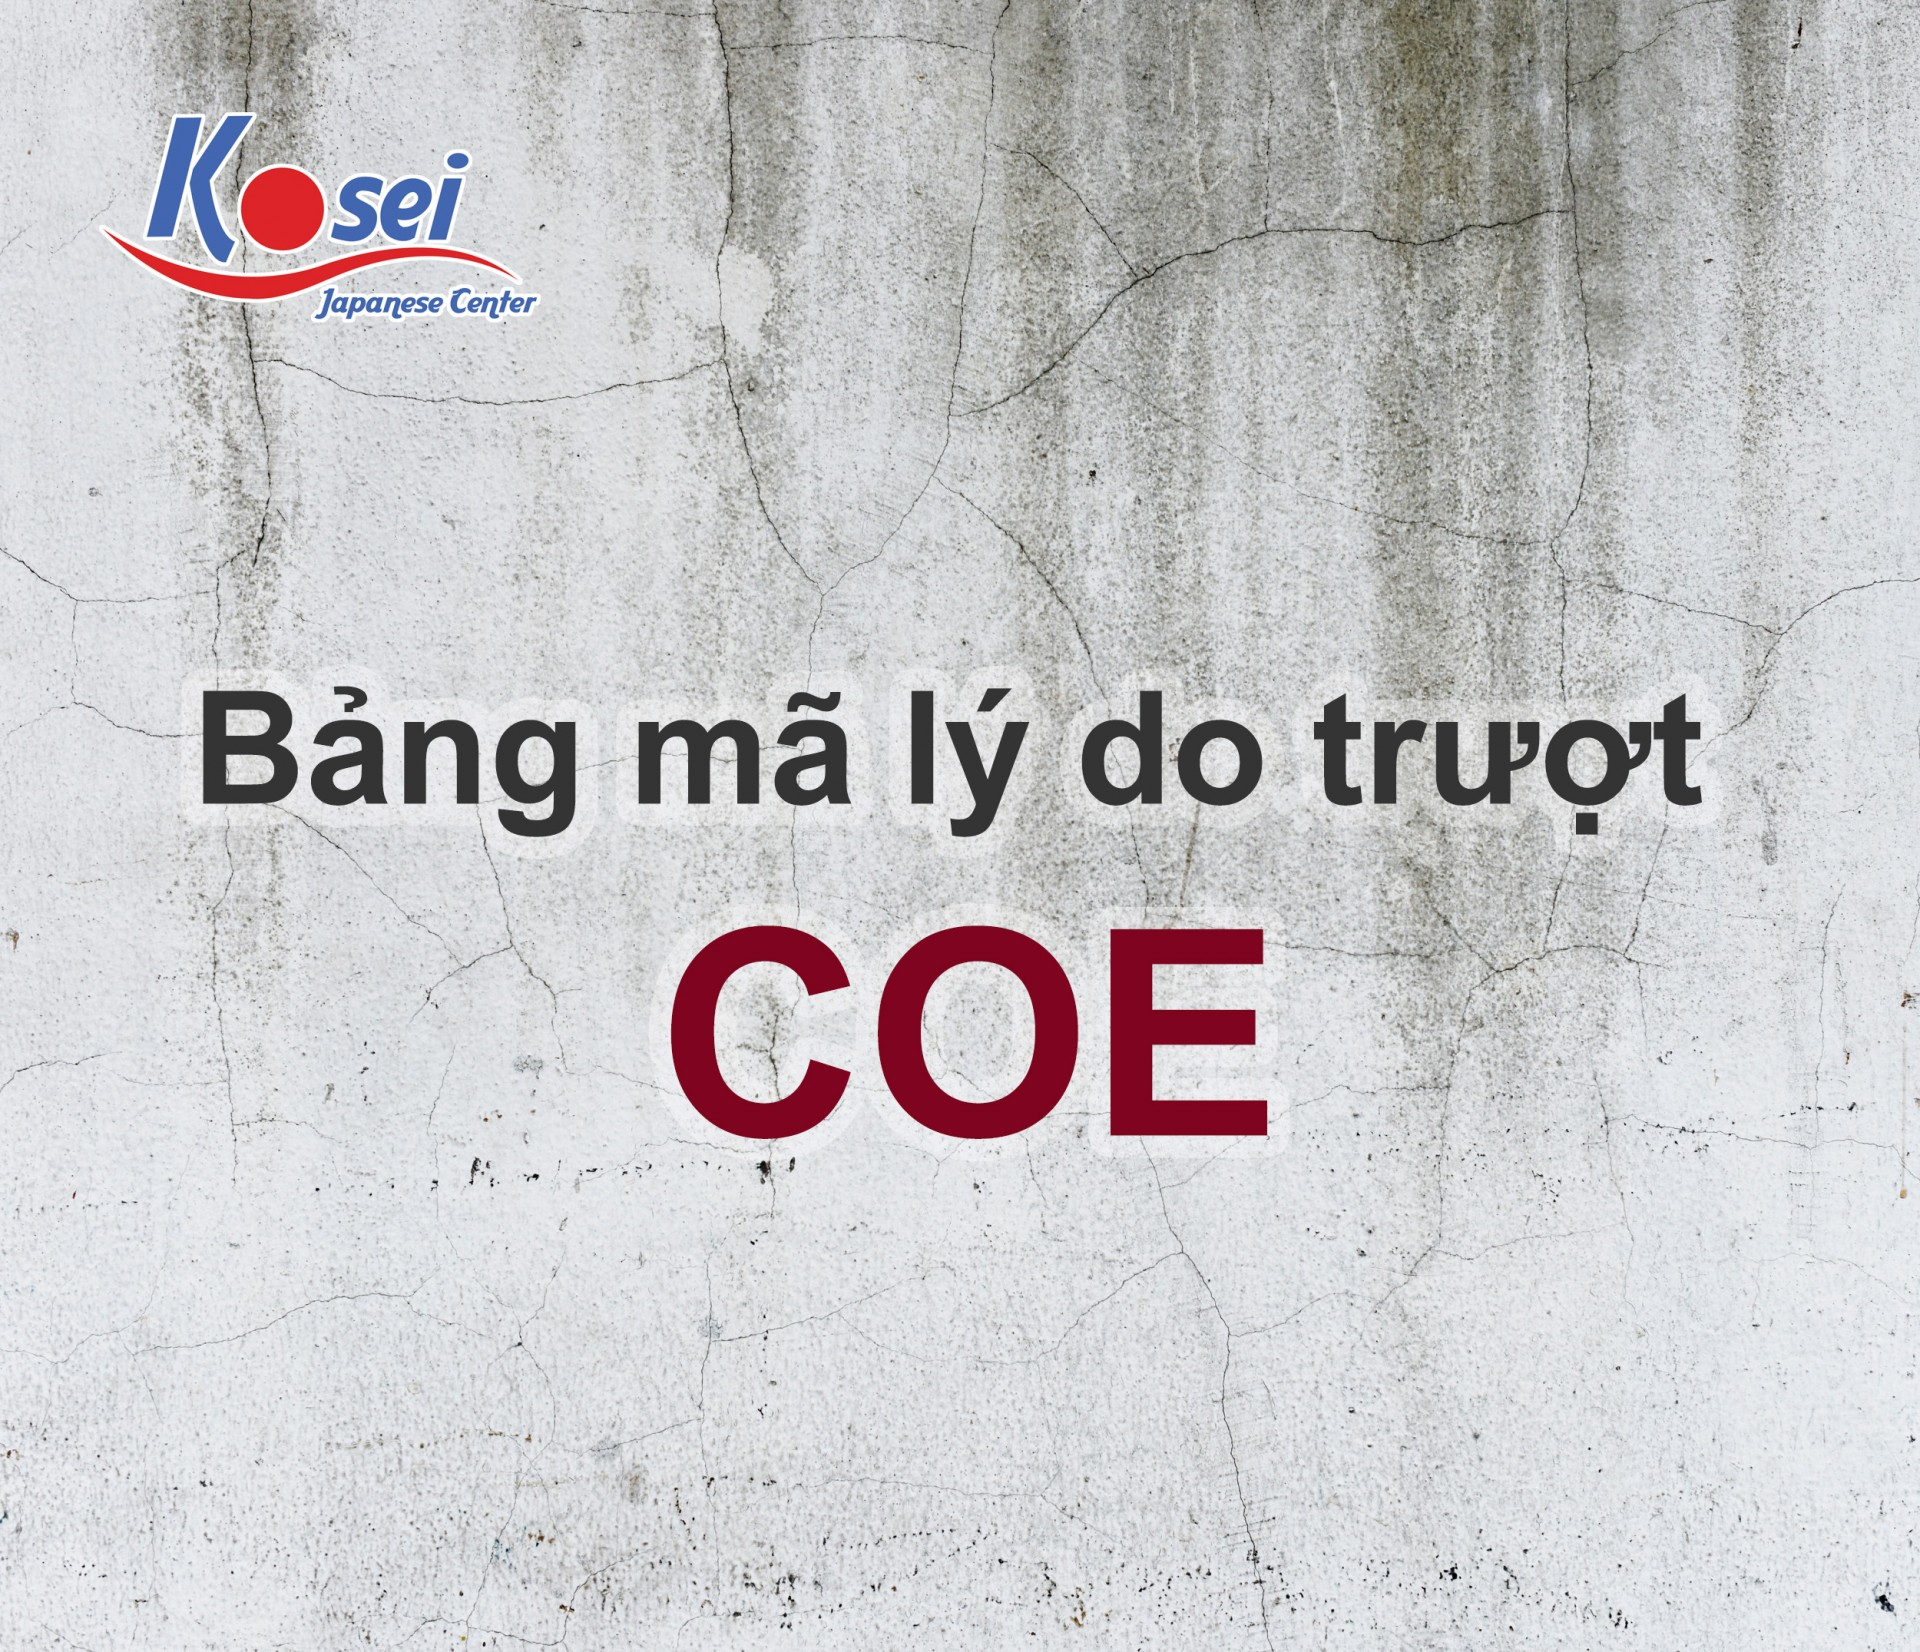 https://kosei.vn/bang-ma-truot-coe-du-hoc-nhat-ban-n1501.html